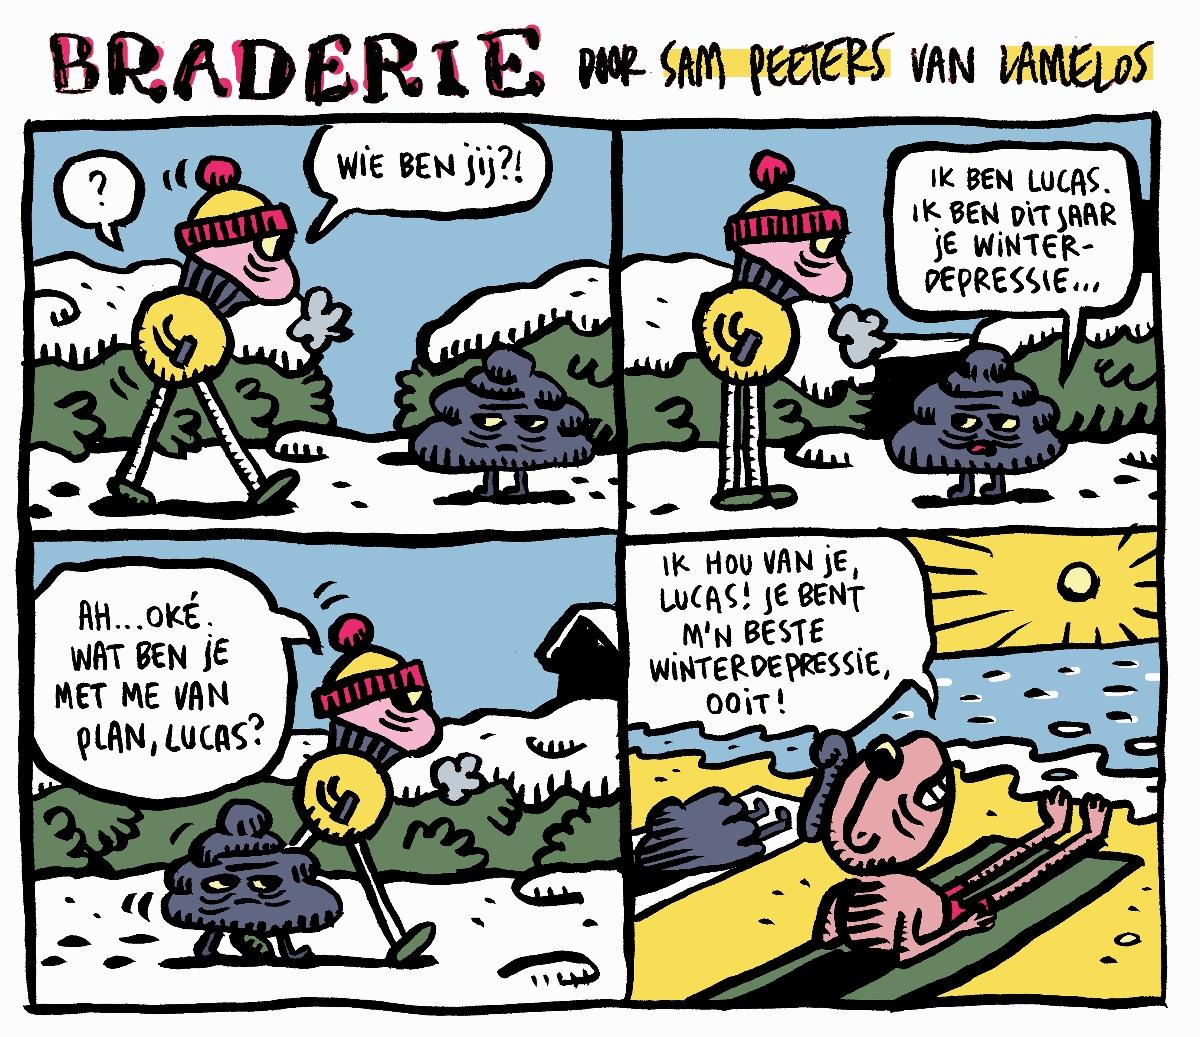 Braderie'18-02 (1200x1037)